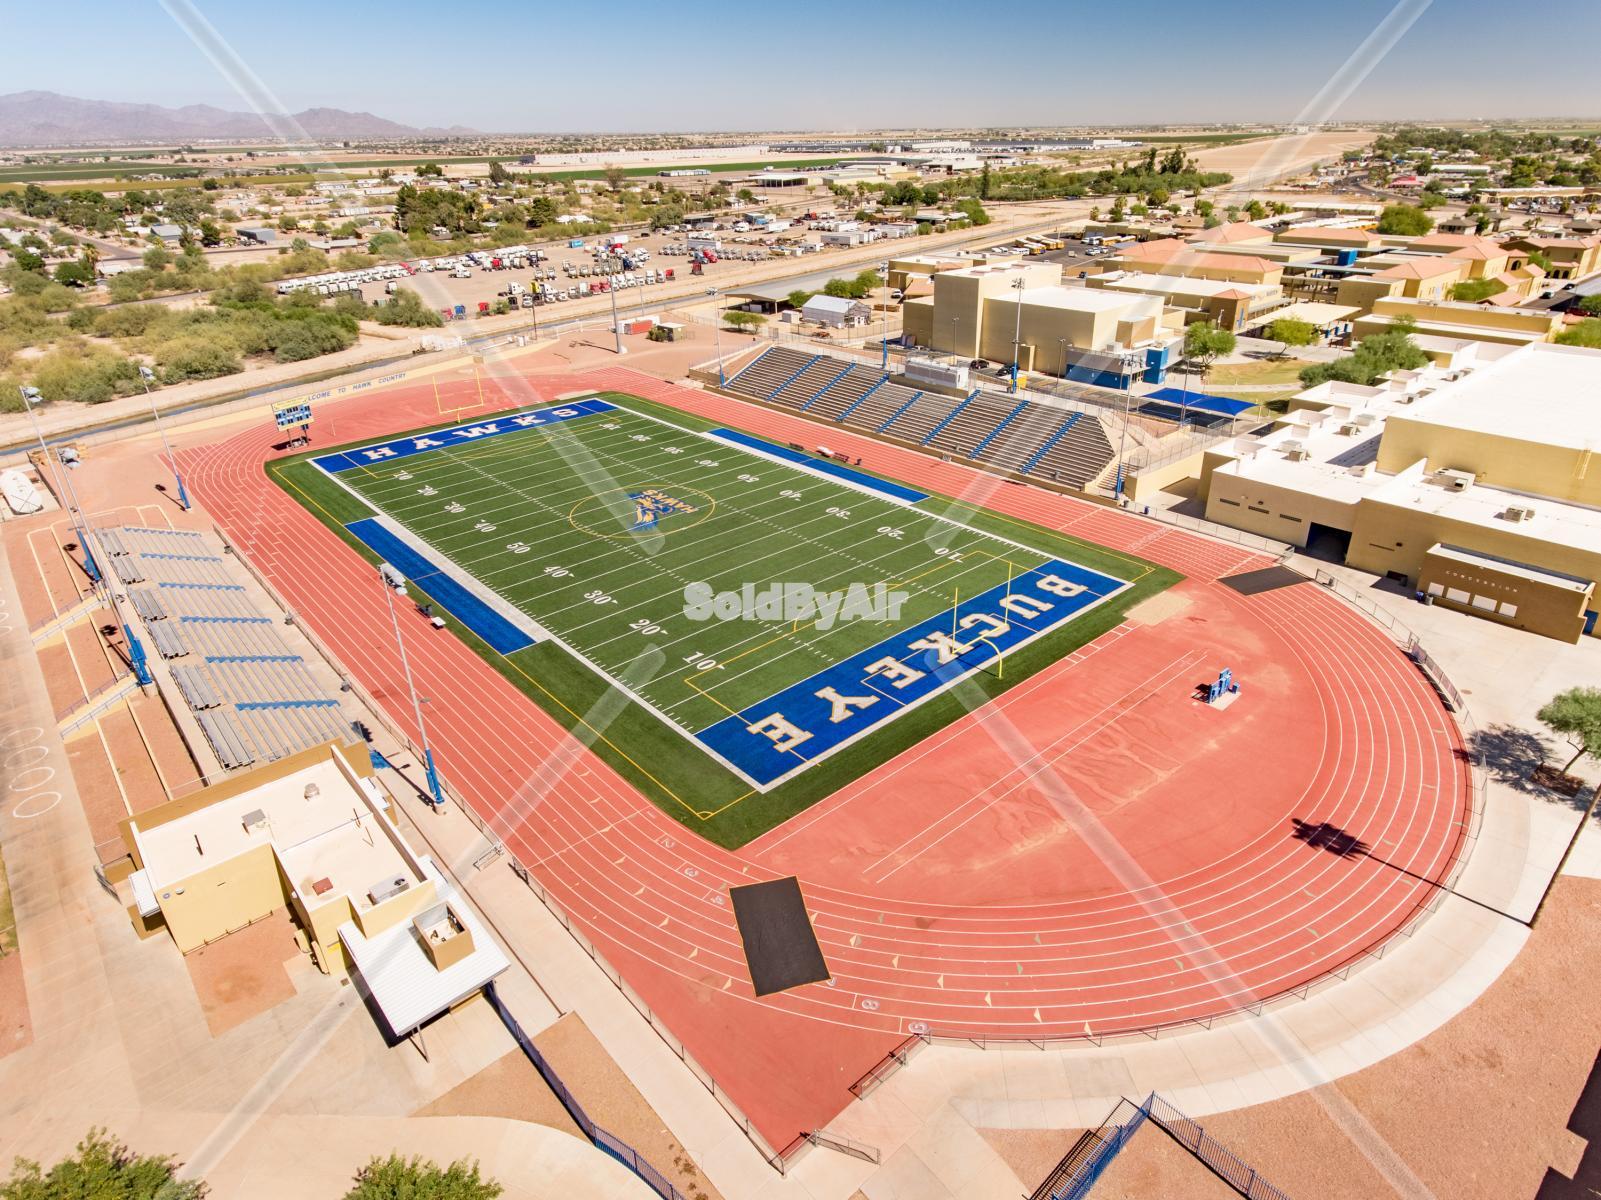 Drone Photo of Washington High School Football in Phoenix Arizona